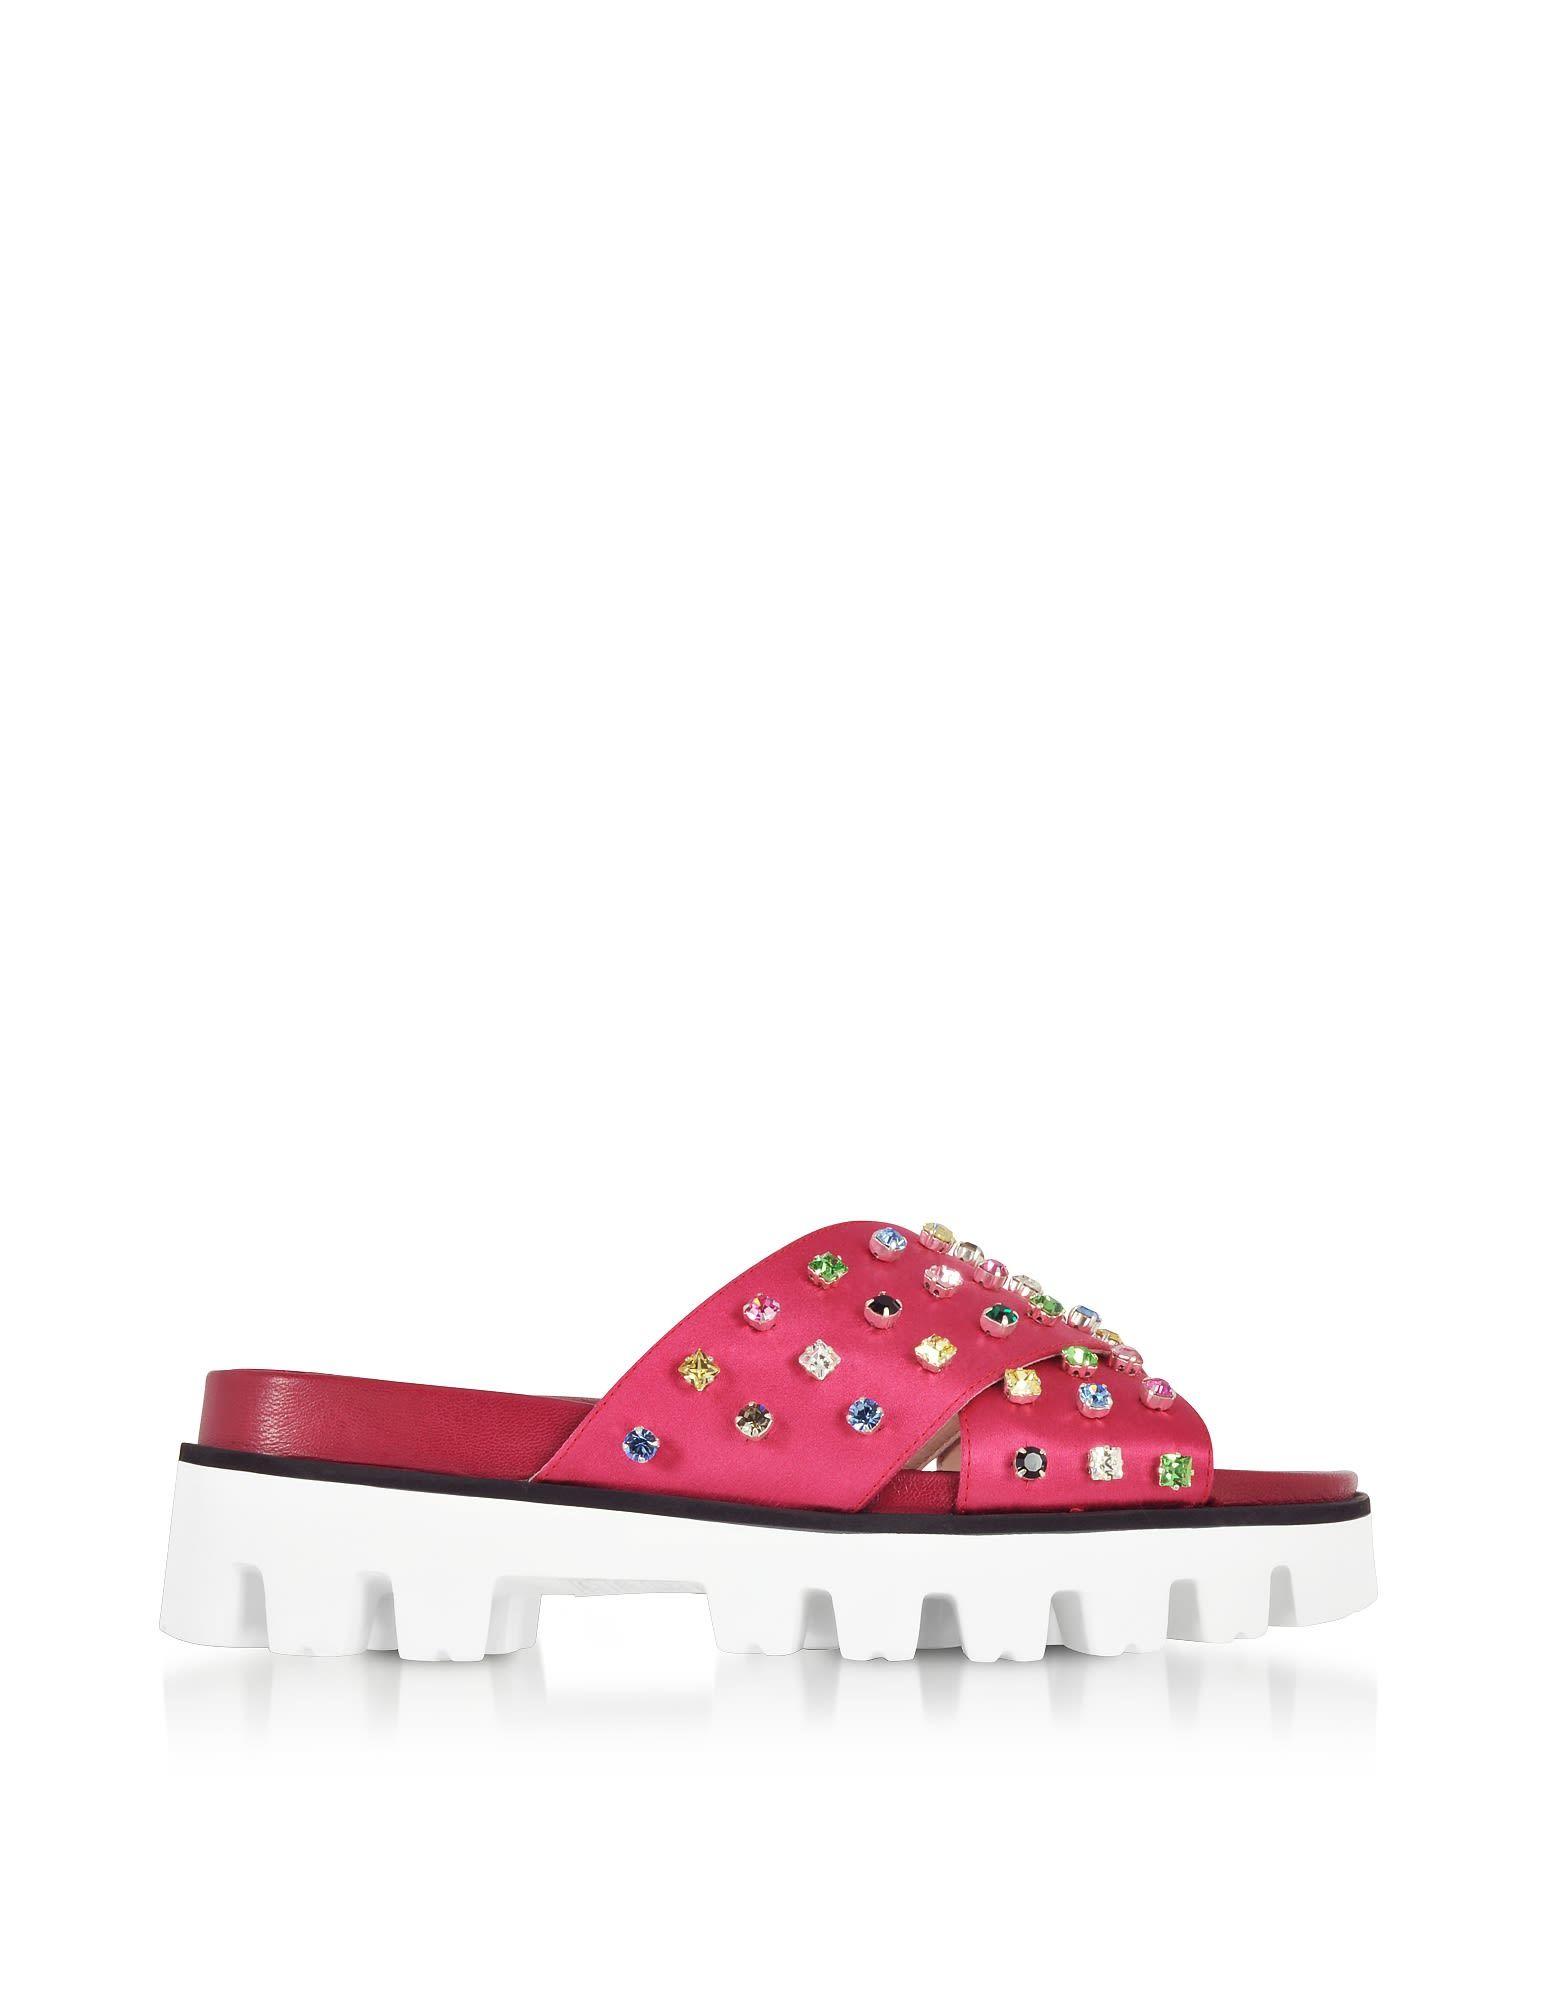 RED Valentino Designer Shoes, Azalea Canvas Slide Sandals w/Crystals